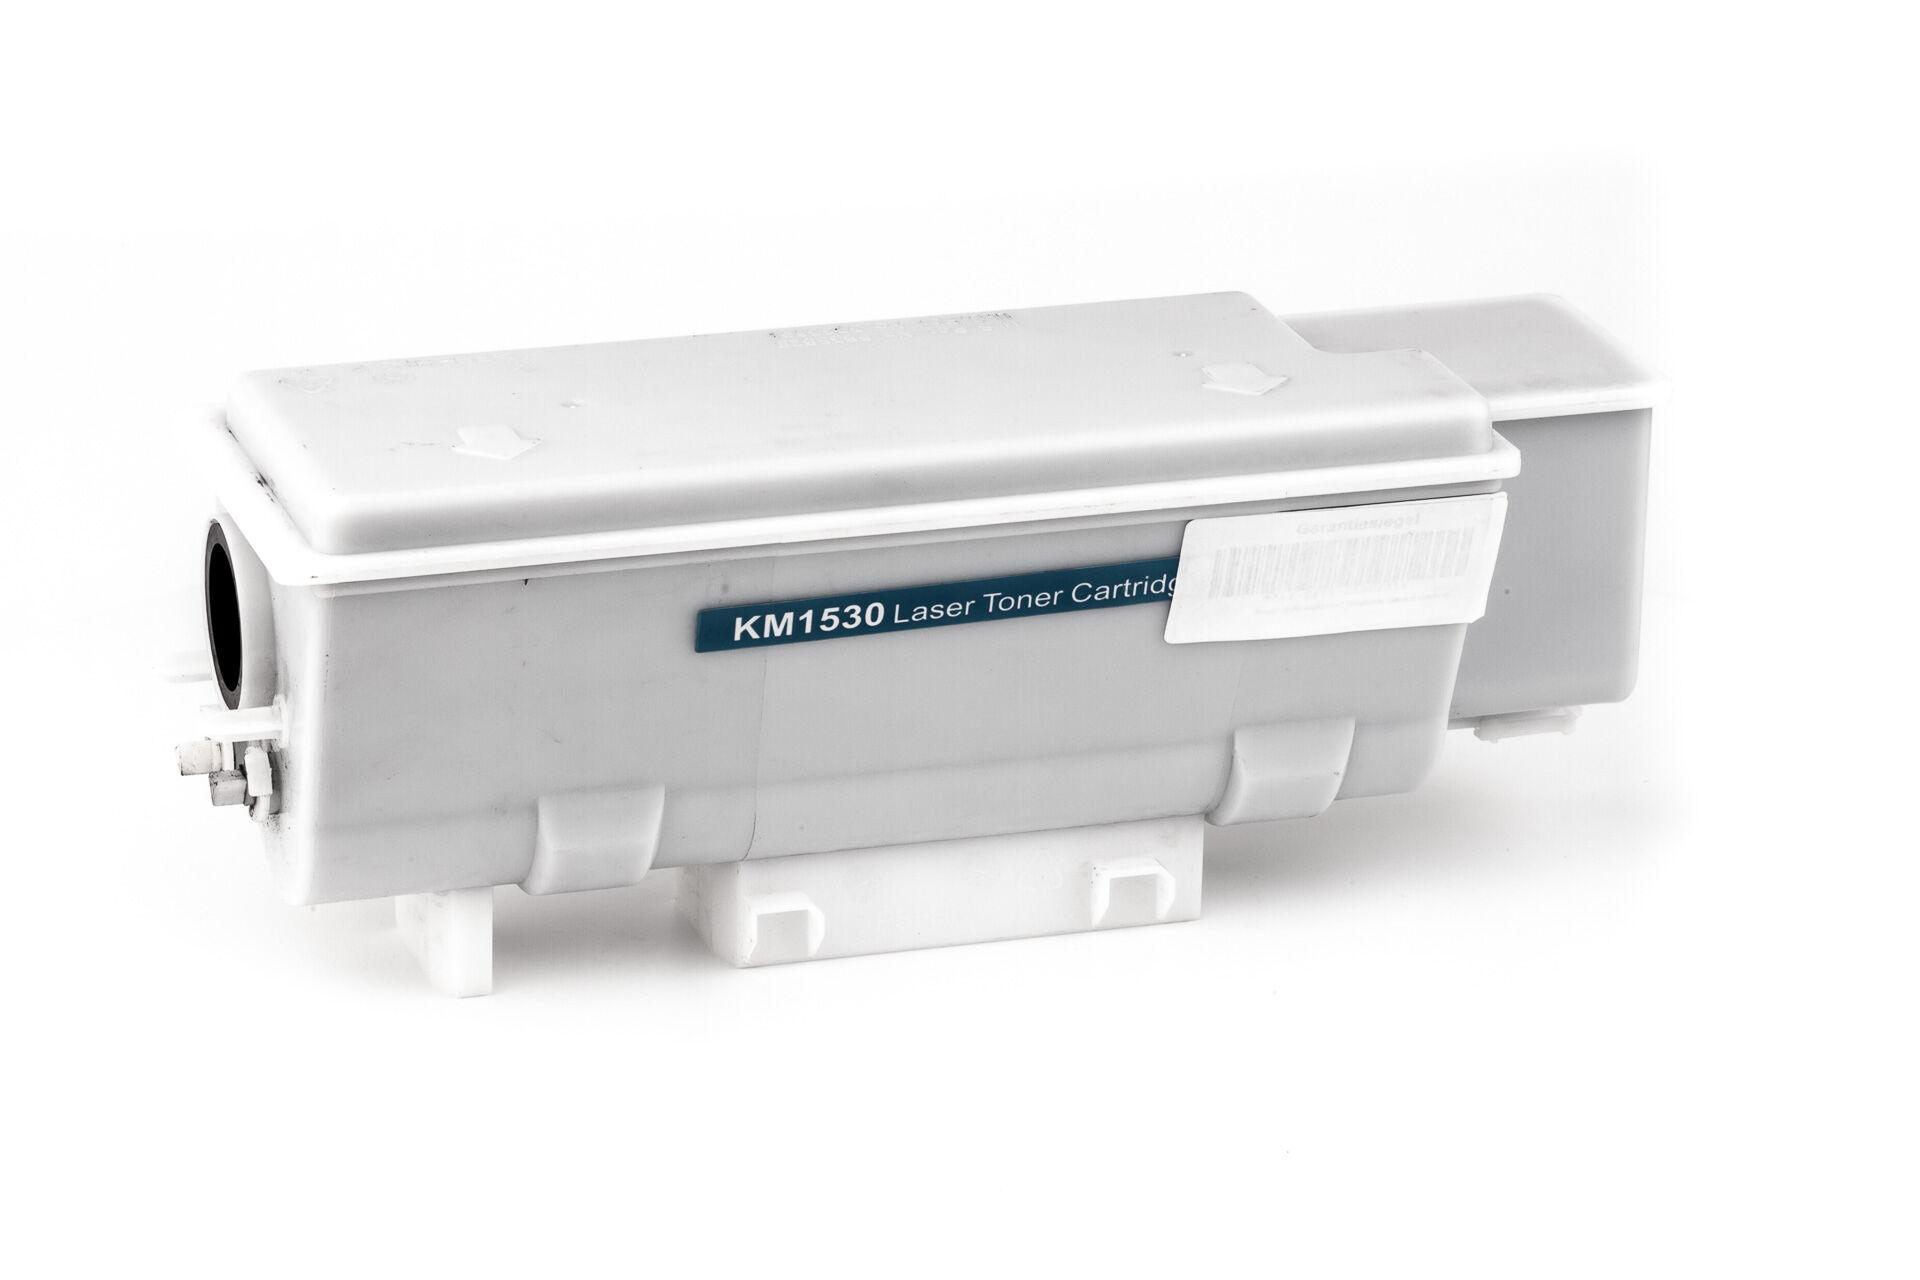 Kyocera Cartouche de Toner pour Kyocera 37028010 noir compatible (de marque ASC)